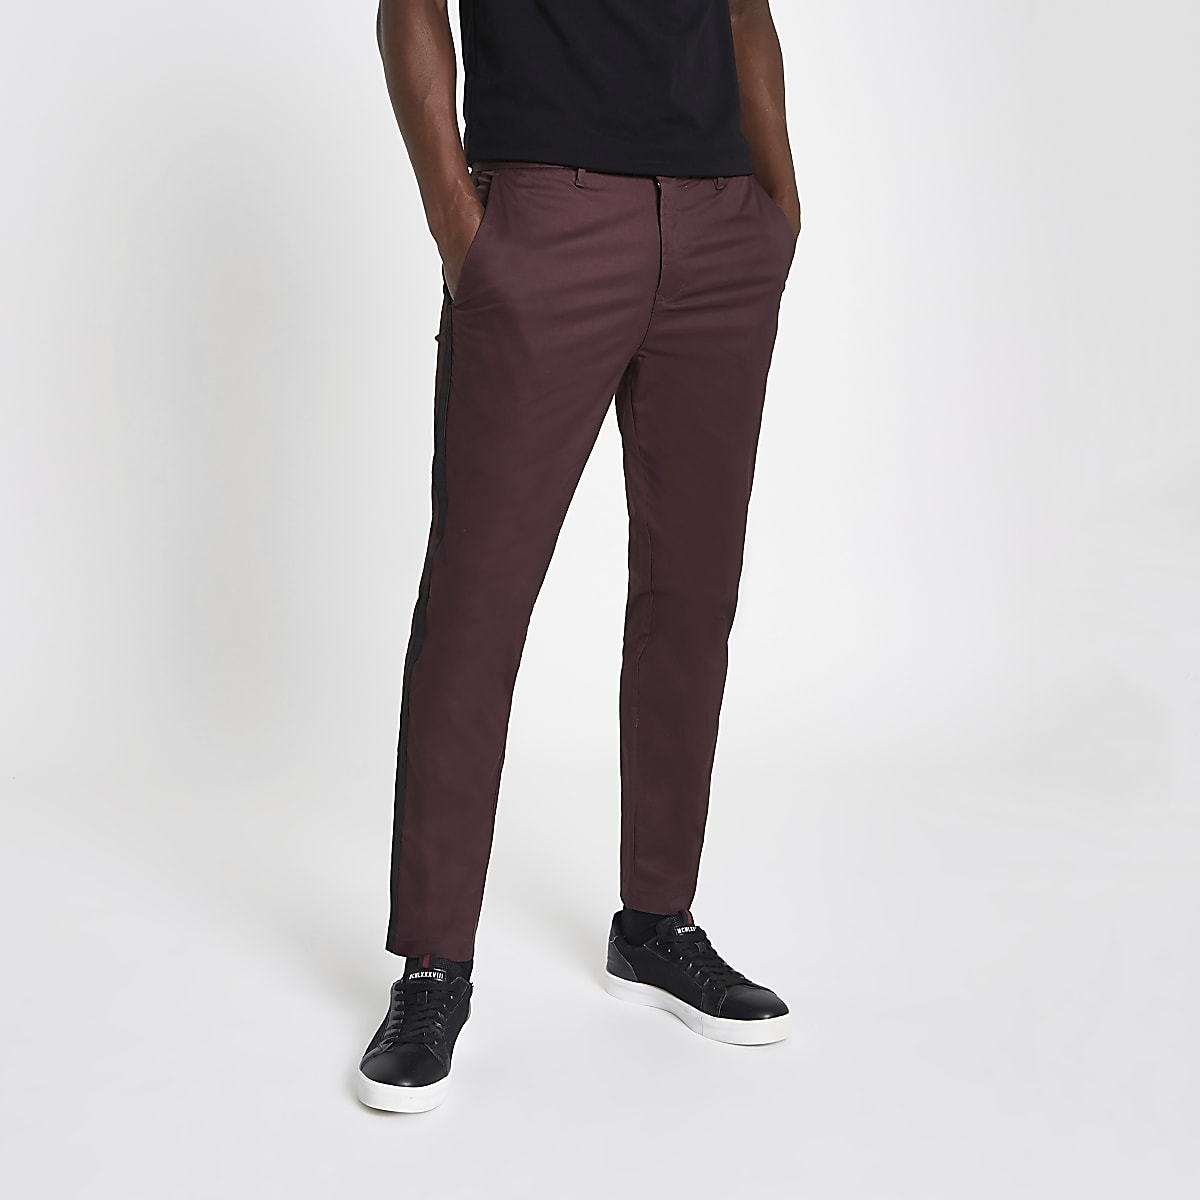 Pantalon chino skinny rouge foncé avec bande latérale